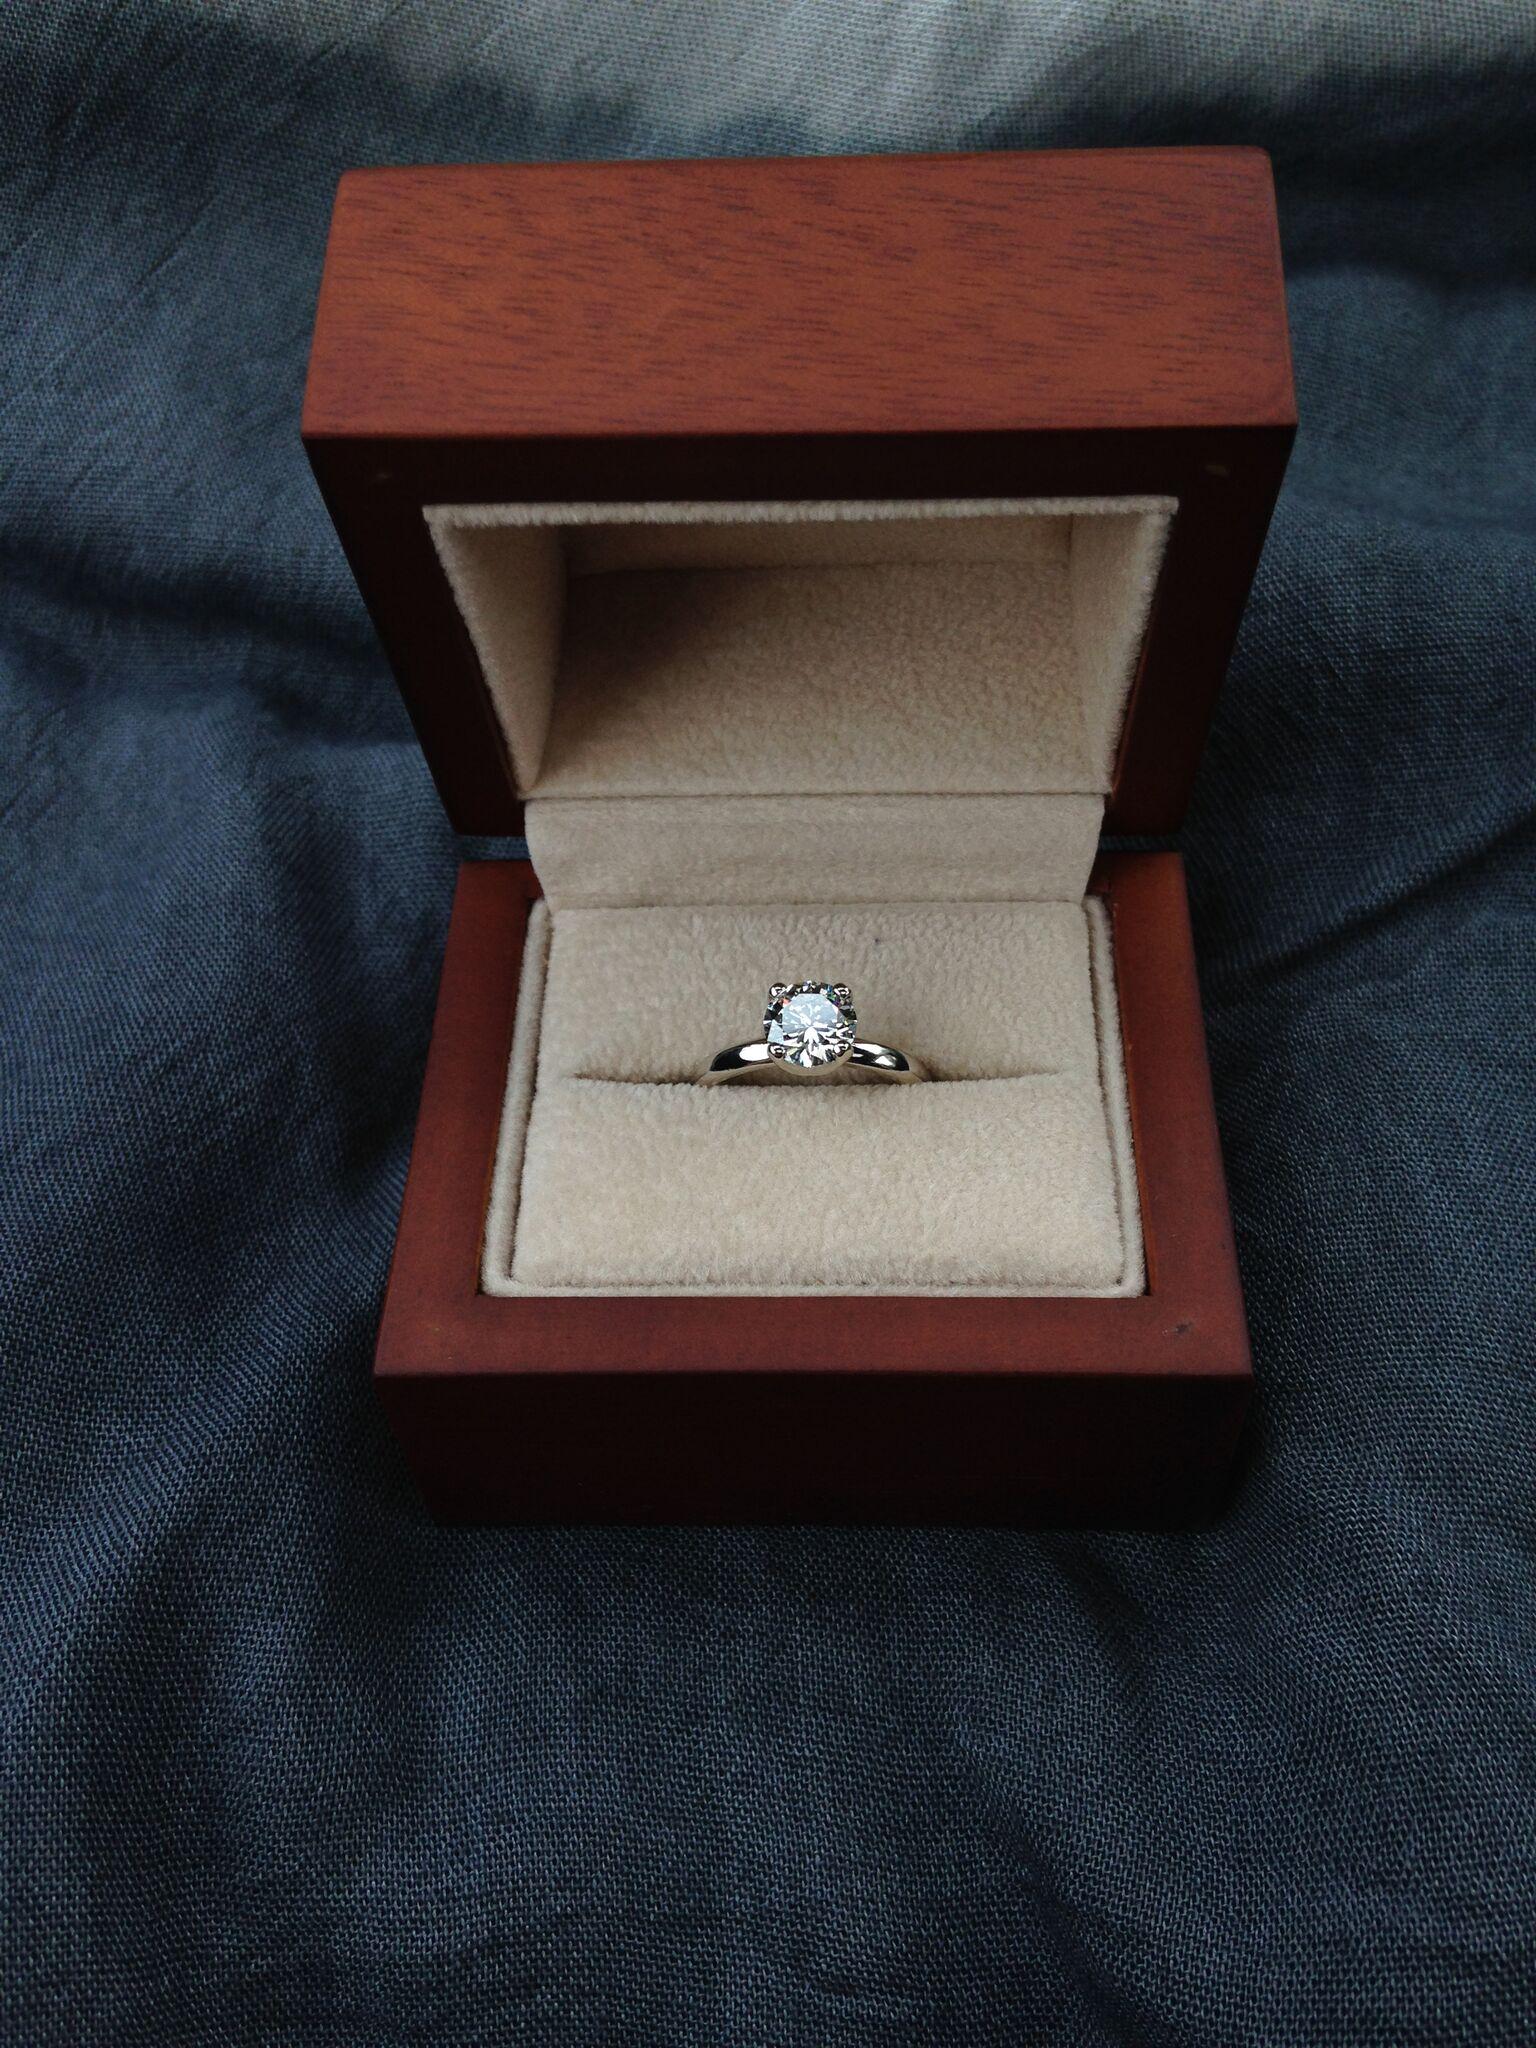 Lab grown diamond engagement ring handmade by Ryan.